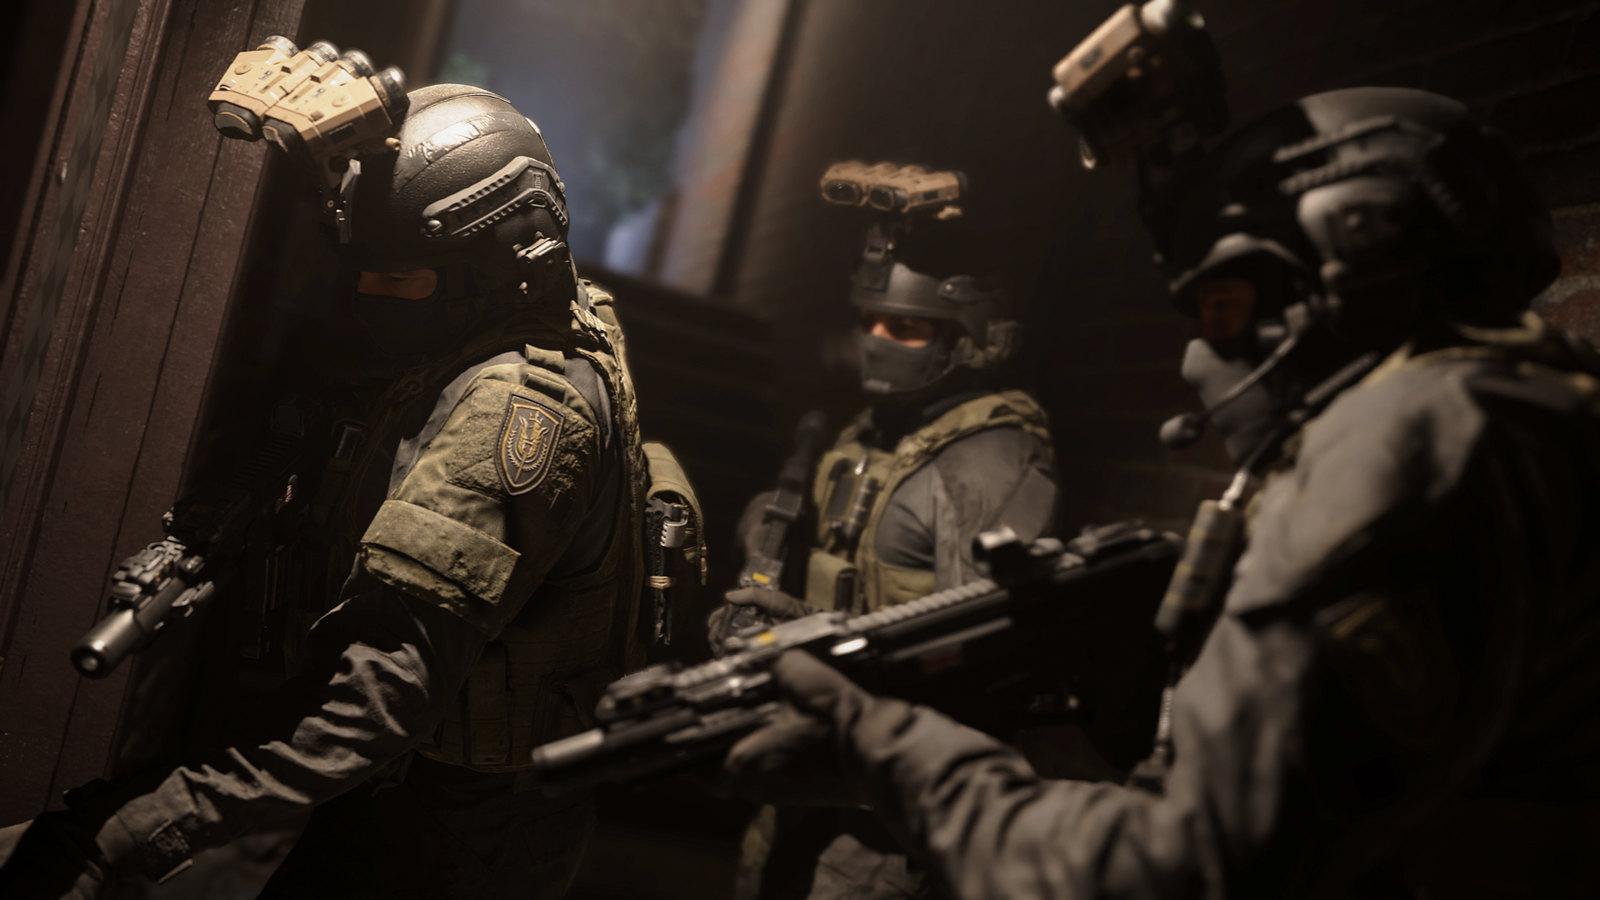 Call of Duty Modern Warfare Soldiers